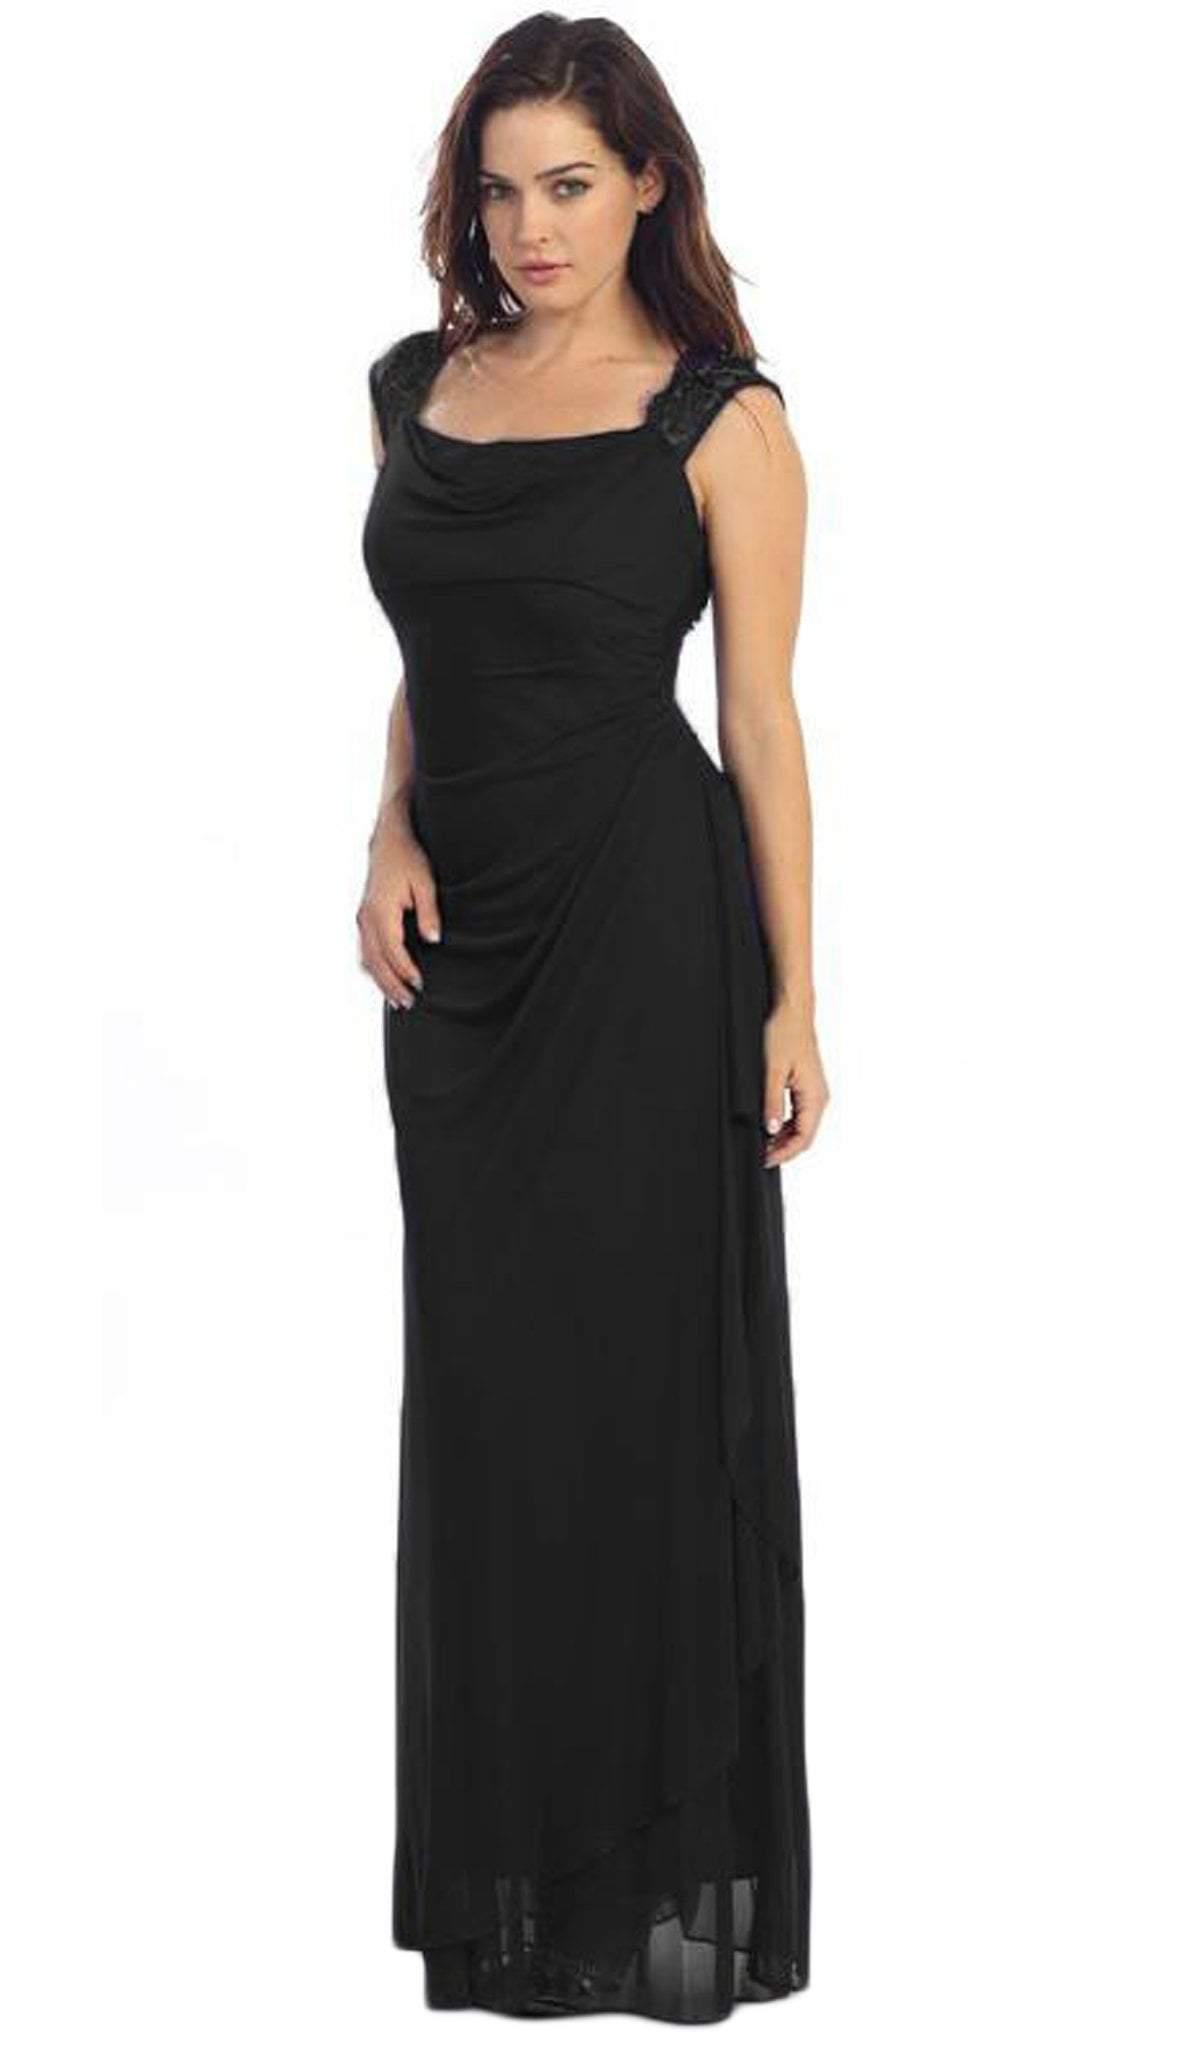 Eureka Fashion - 1927 Lace Cap Sleeve Draped Chiffon Gown